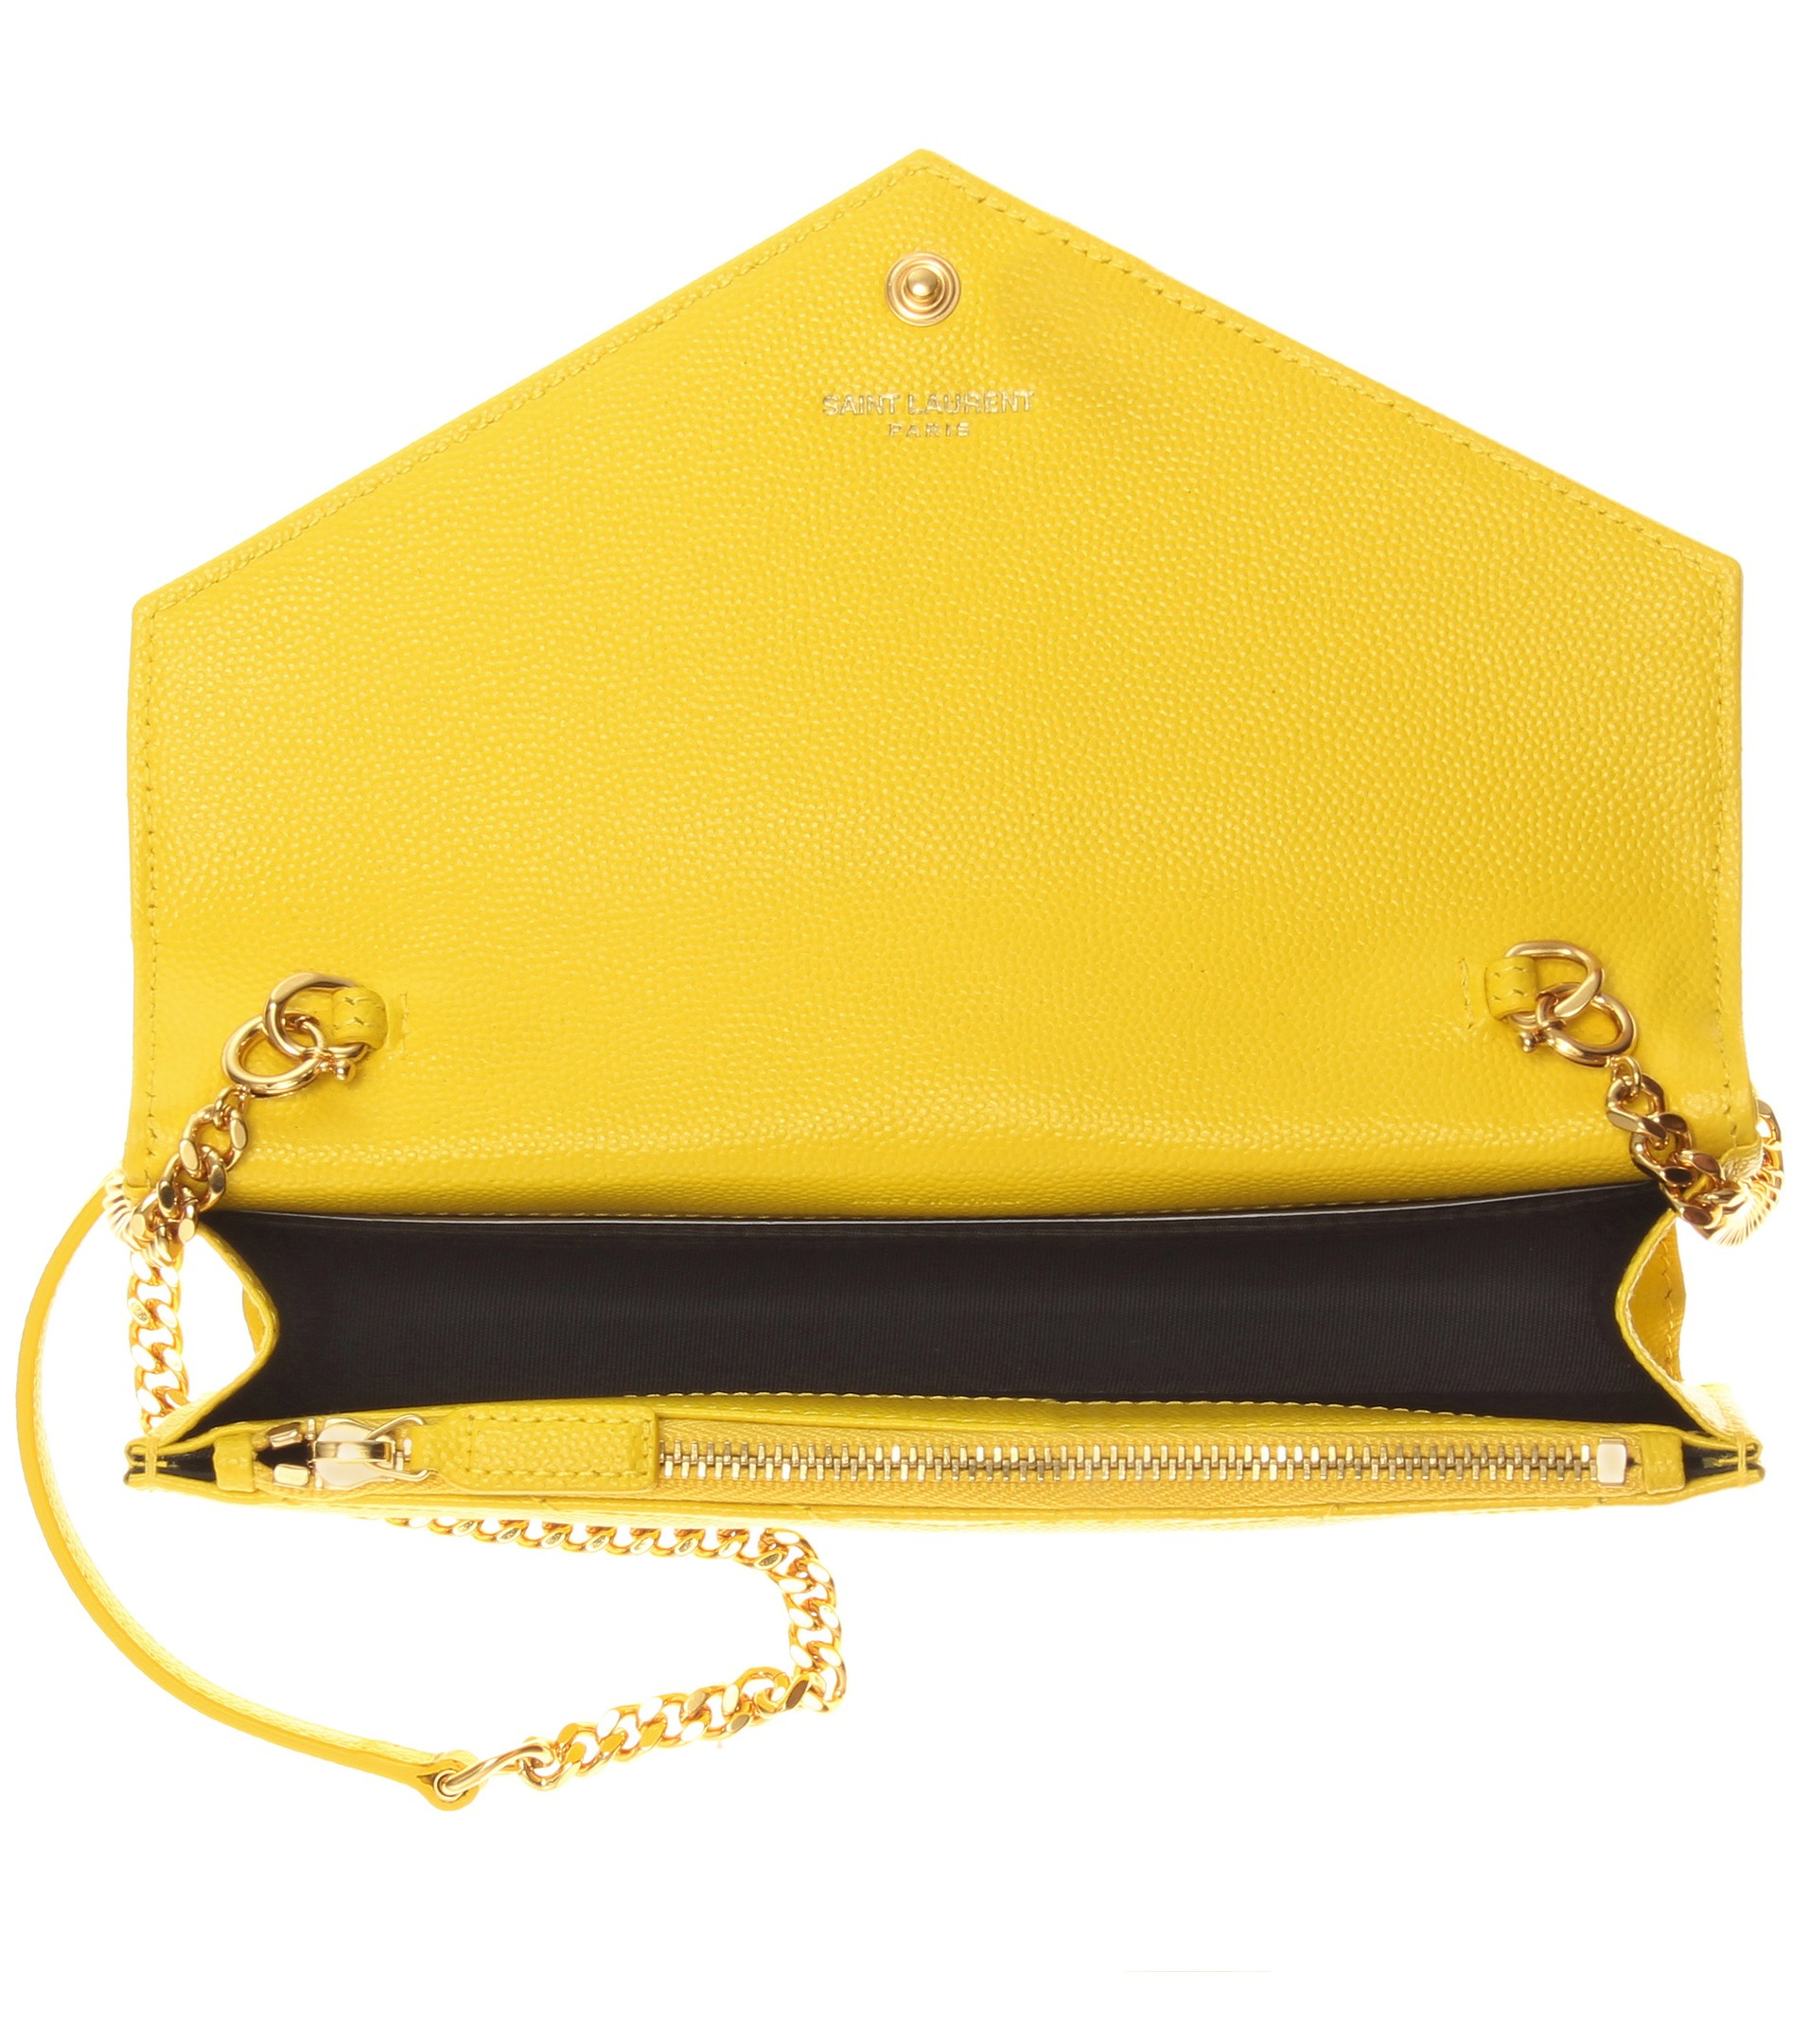 289da5768c73 Lyst - Saint Laurent Classic Monogram Quilted Leather Shoulder Bag ...